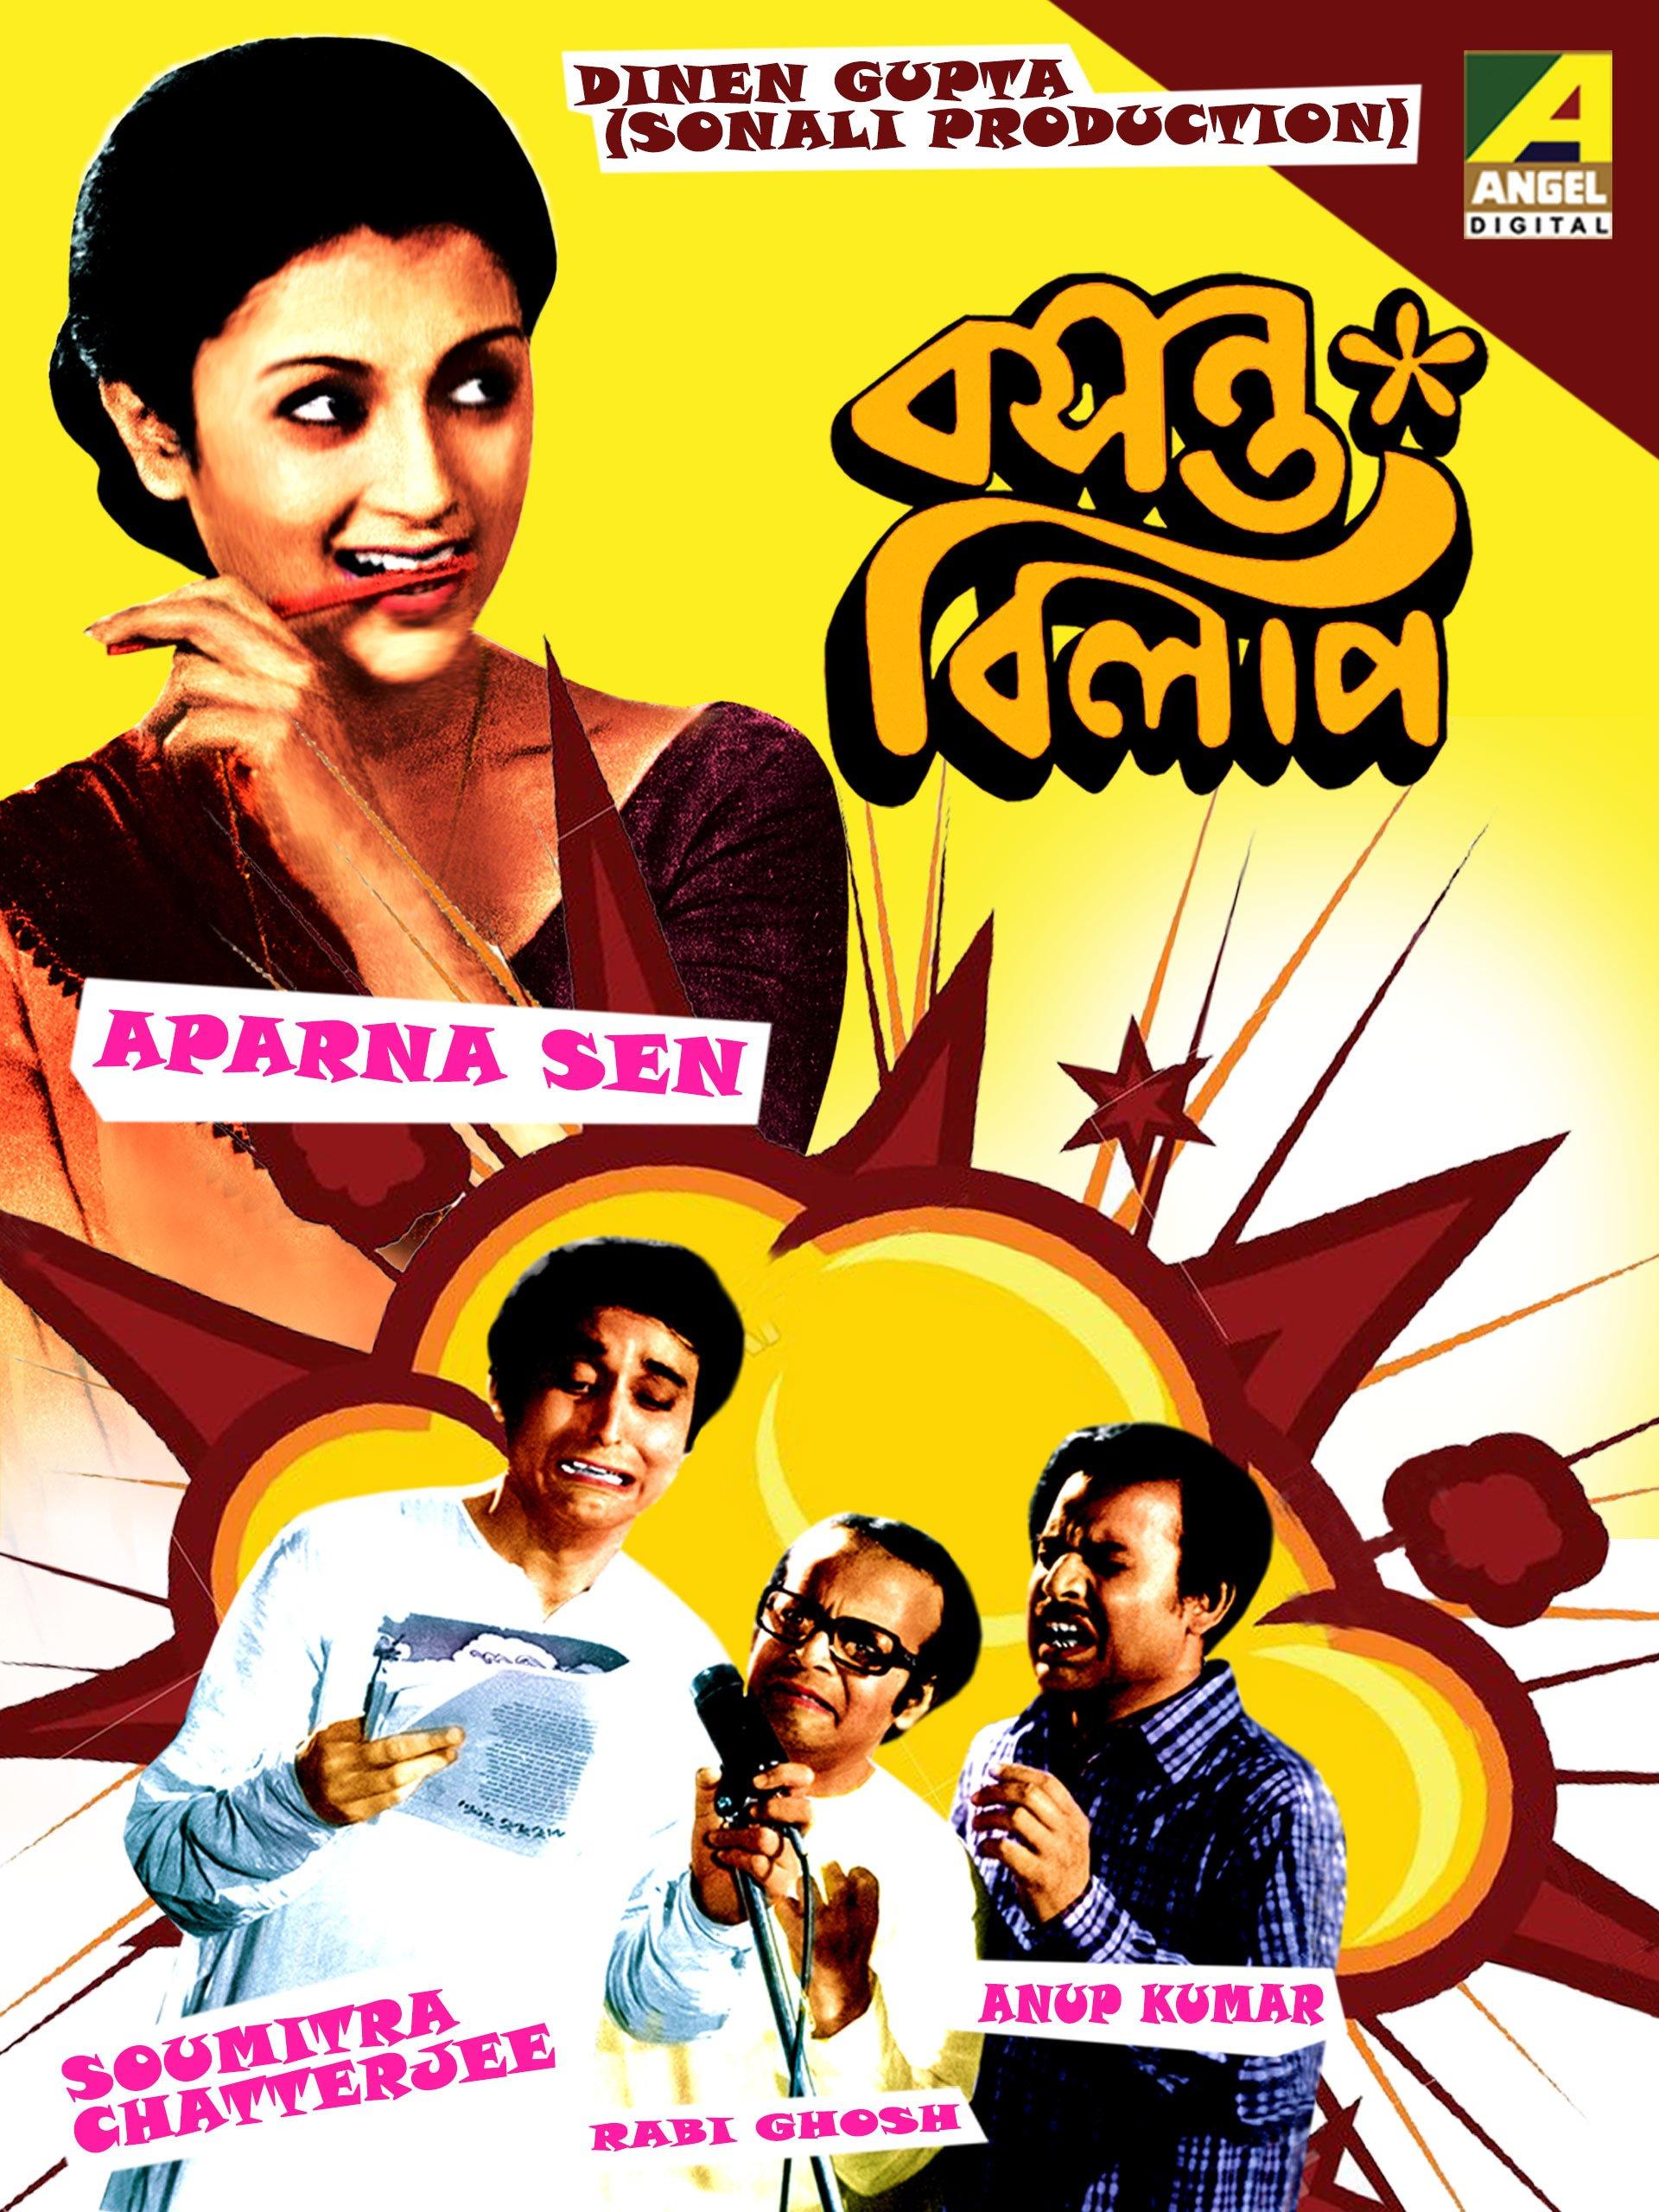 swet pathorer thala full movie